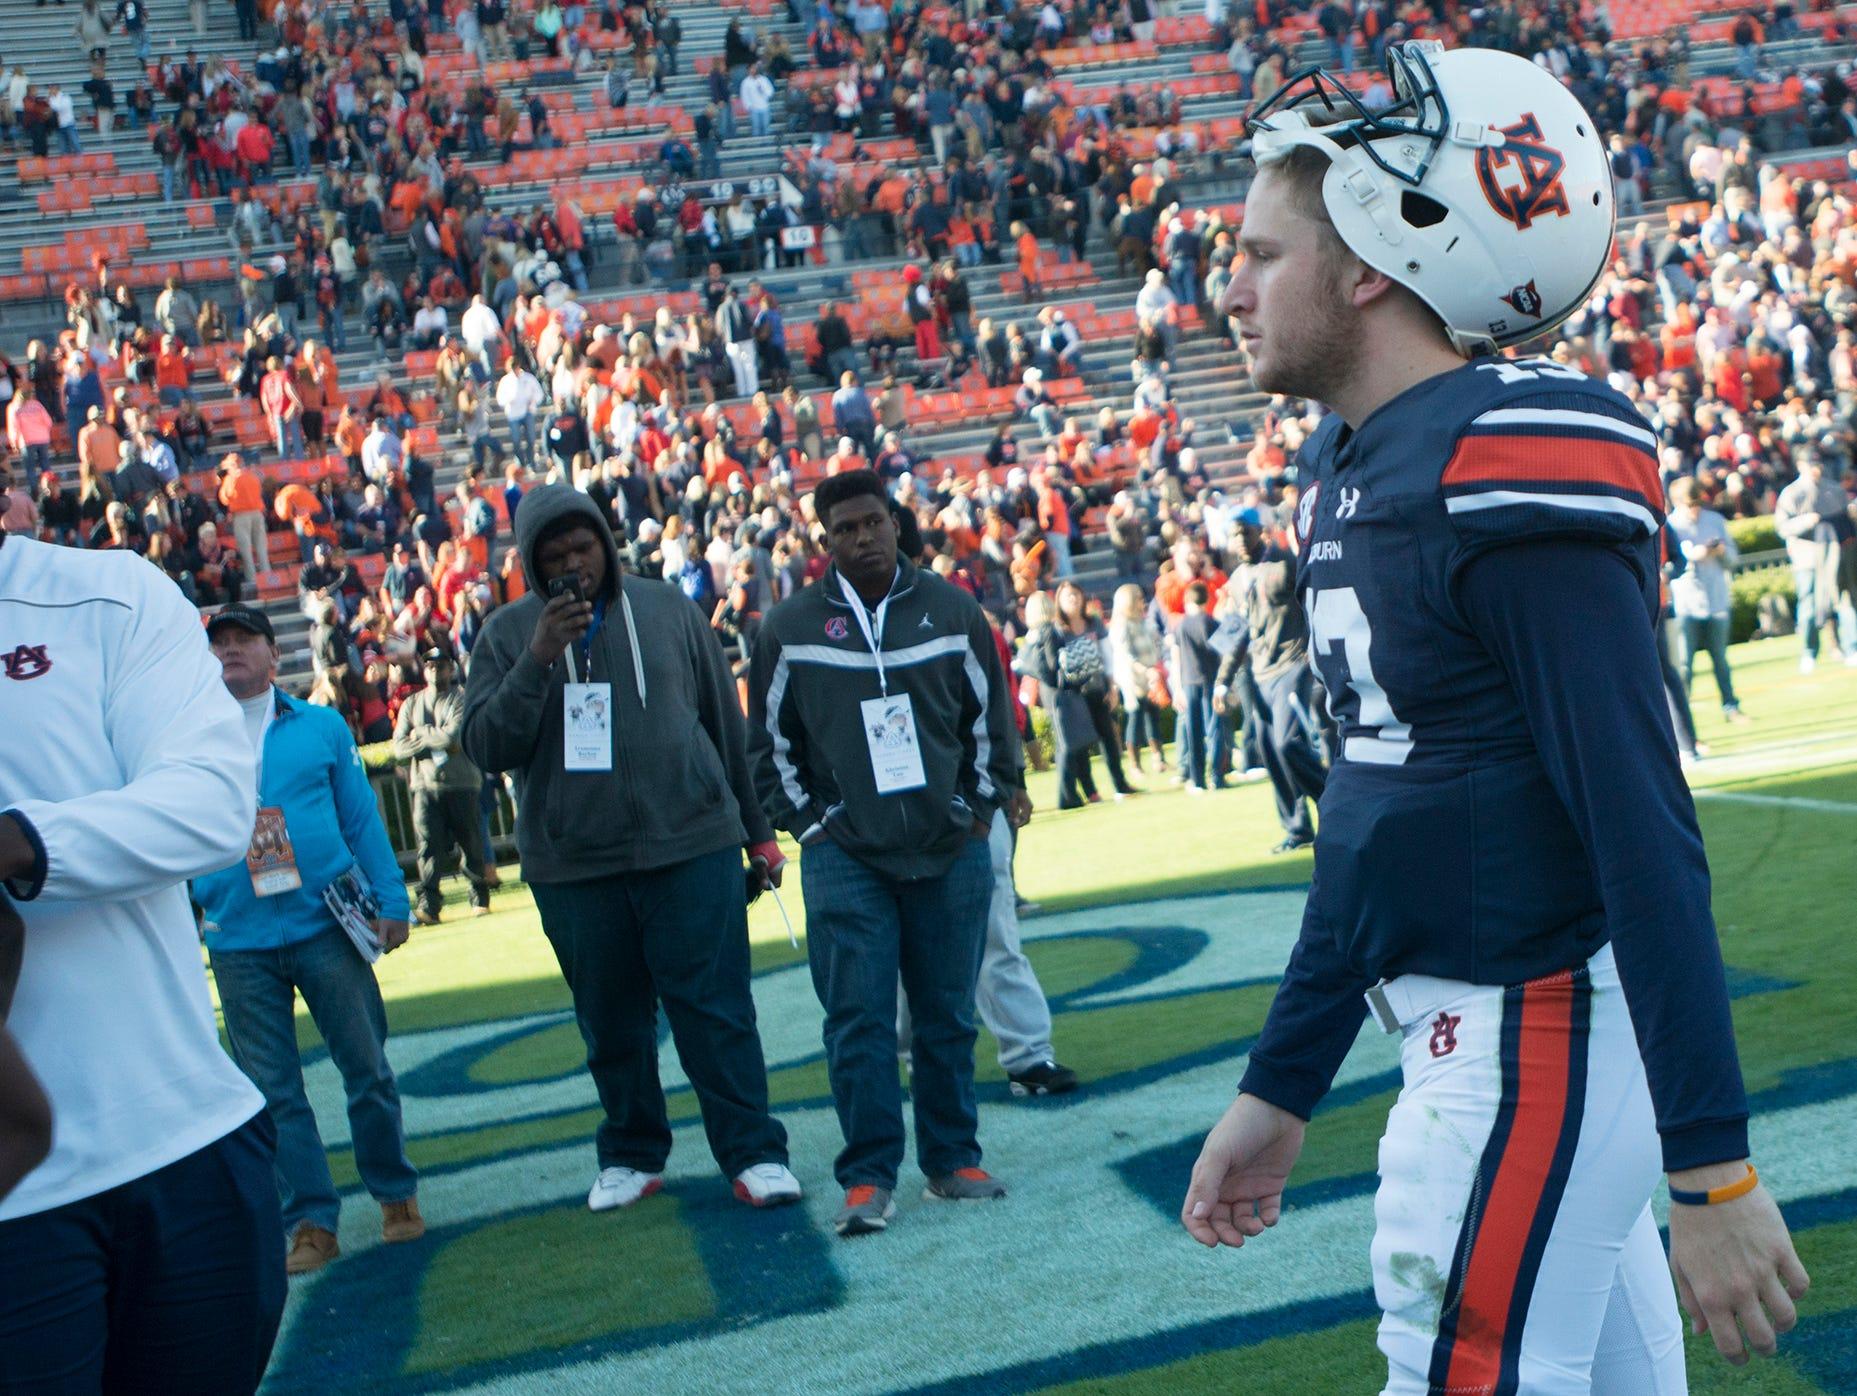 Auburn Tigers quarterback Sean White (13) walks off the field after the NCAA football game between Auburn Tigers and Georgia on Saturday, Nov. 14, 2015, in Auburn, Ala. Georgia defeated Auburn Tigers 20-13.